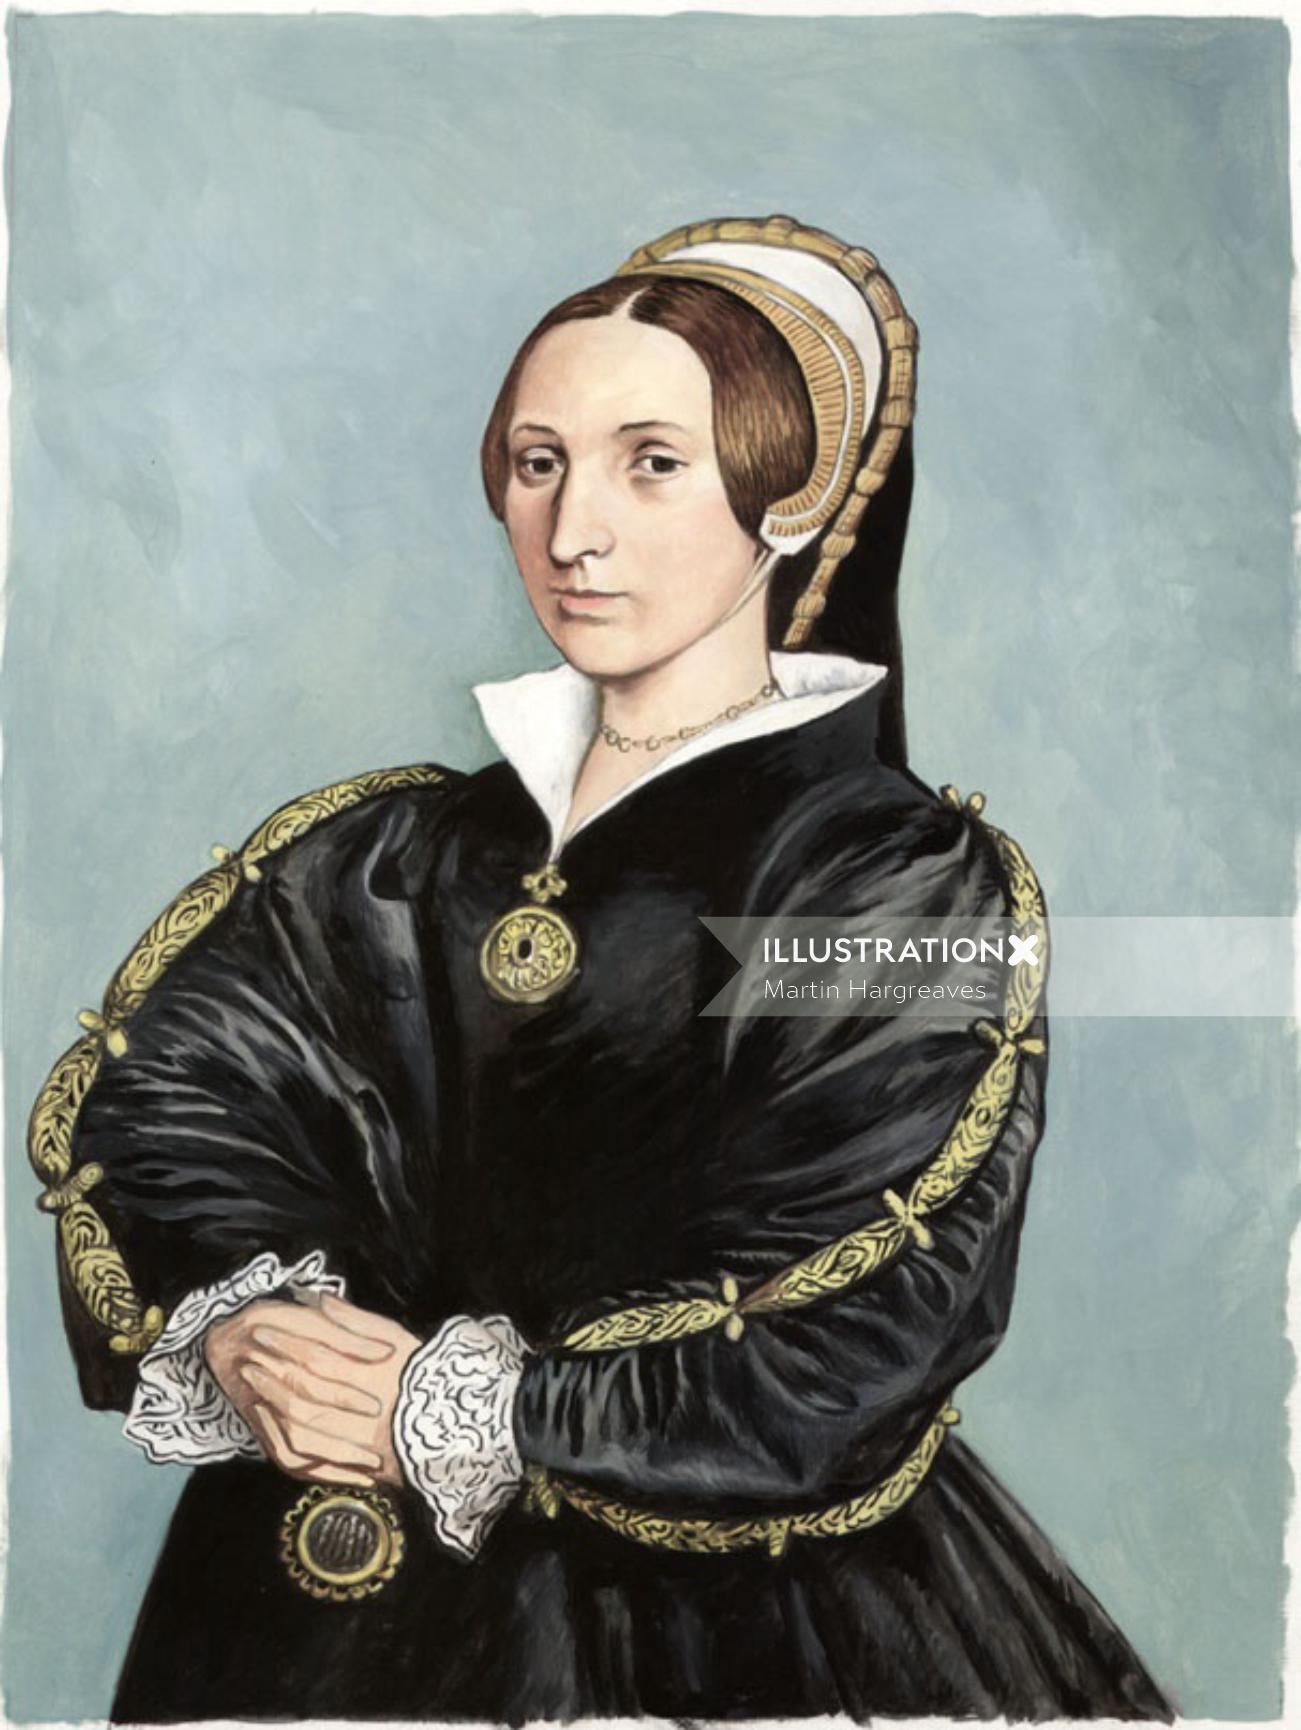 Pastiche portrait art of Katherine Howard